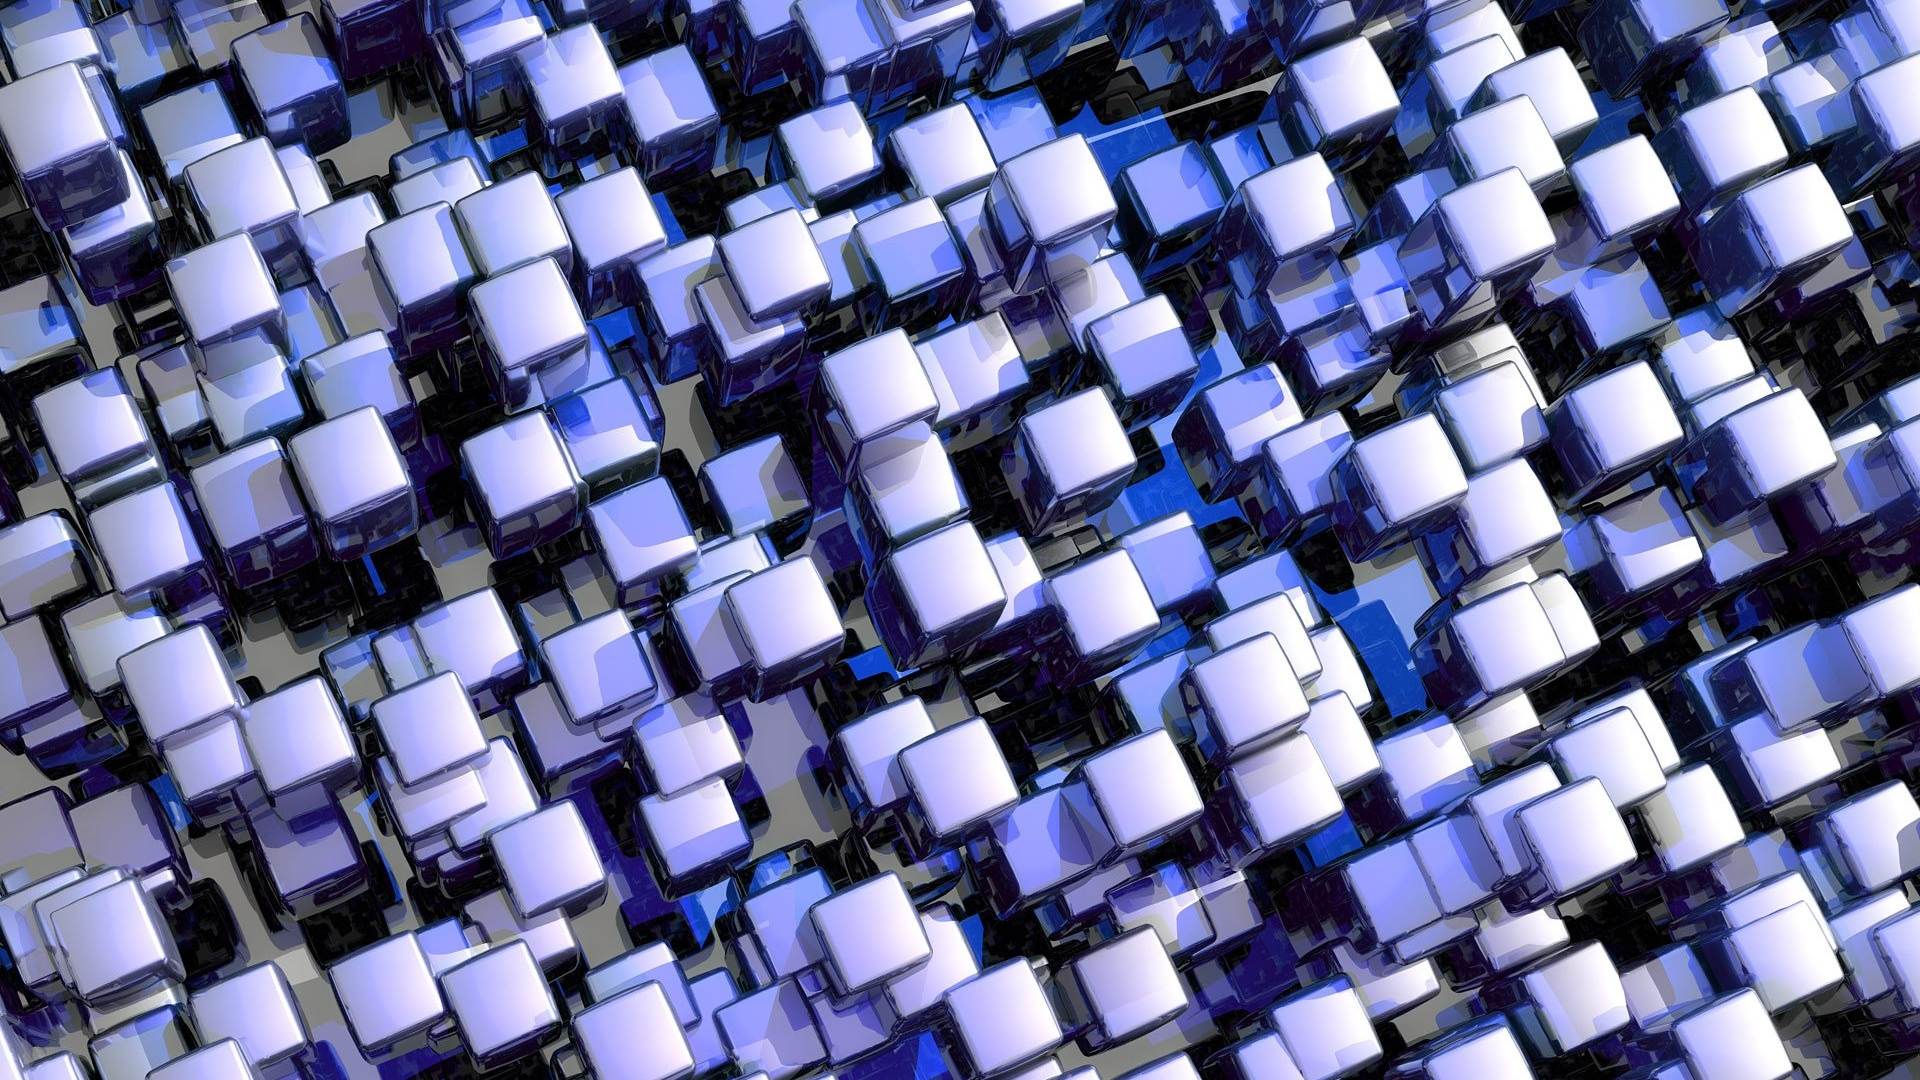 Download Wallpaper 1920x1080 Cubes Purple Glass Set